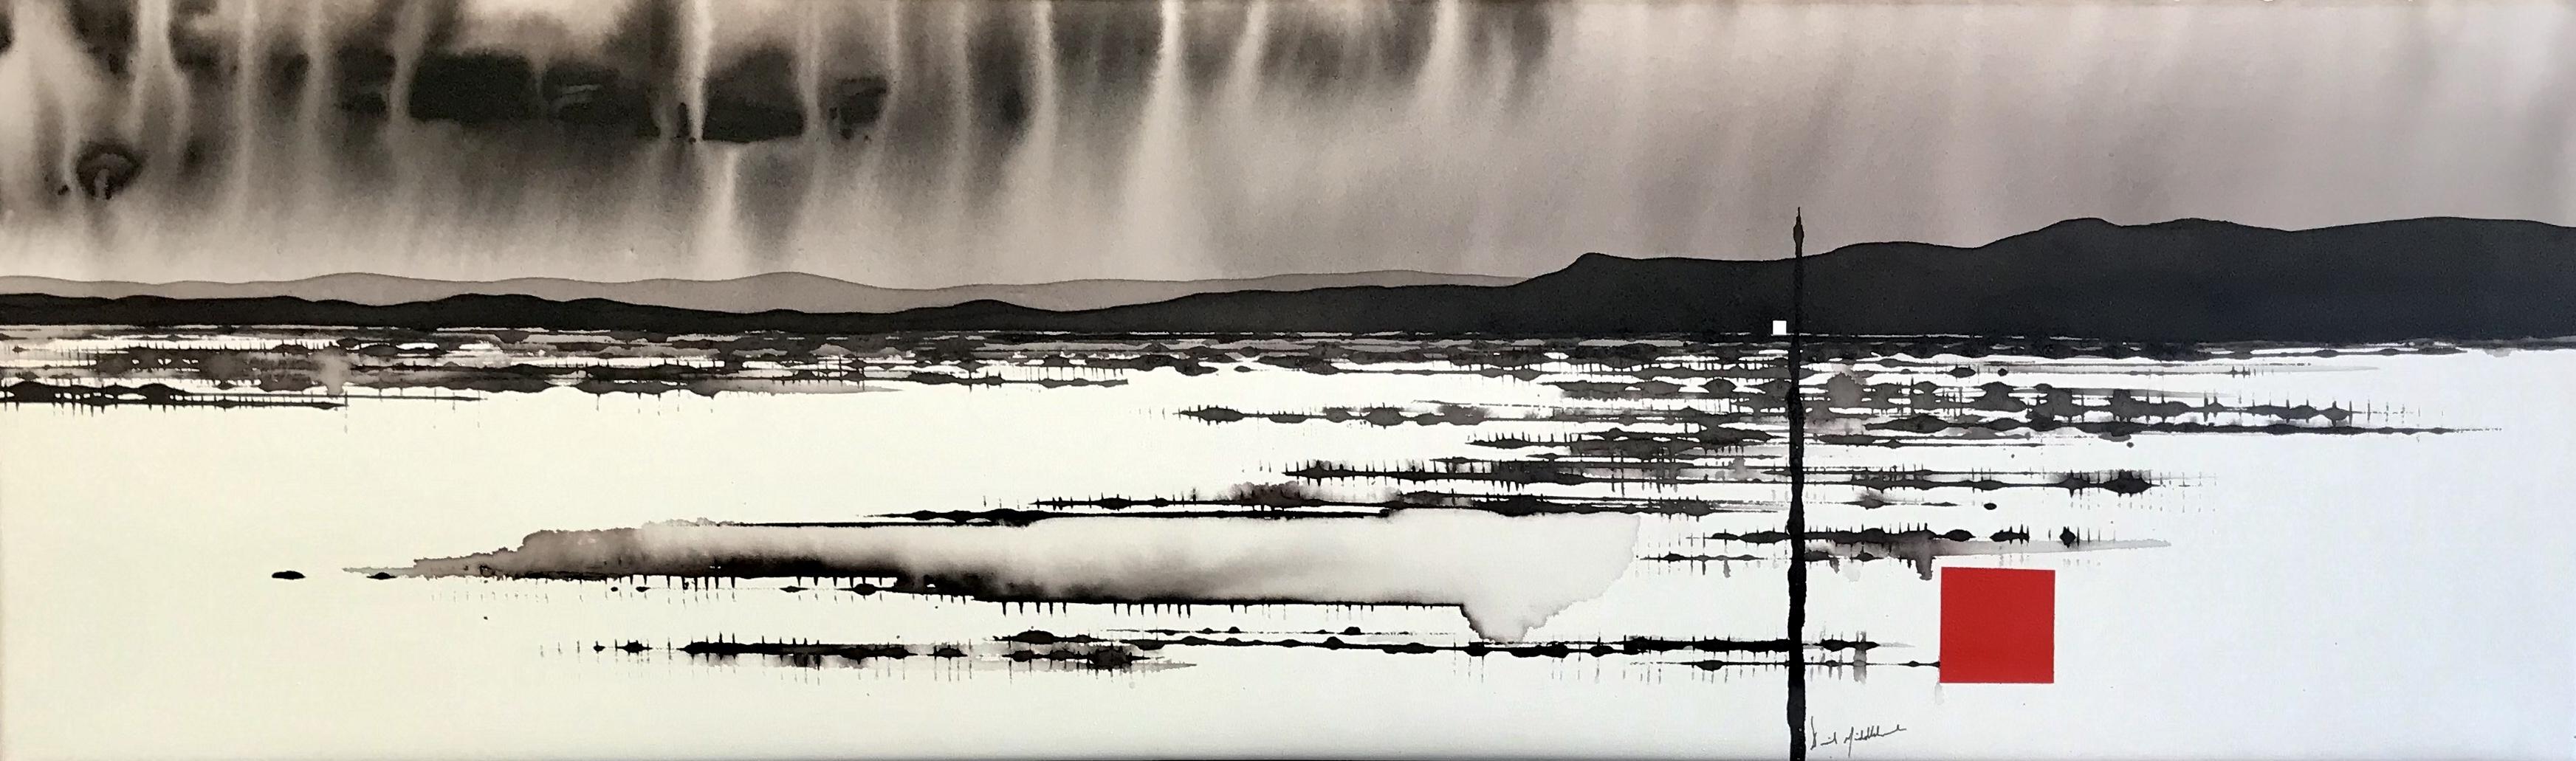 Art Atrium - David Middlebrook - Edge of Desert Lake, ink and acrylic on canvas 30x100cm.